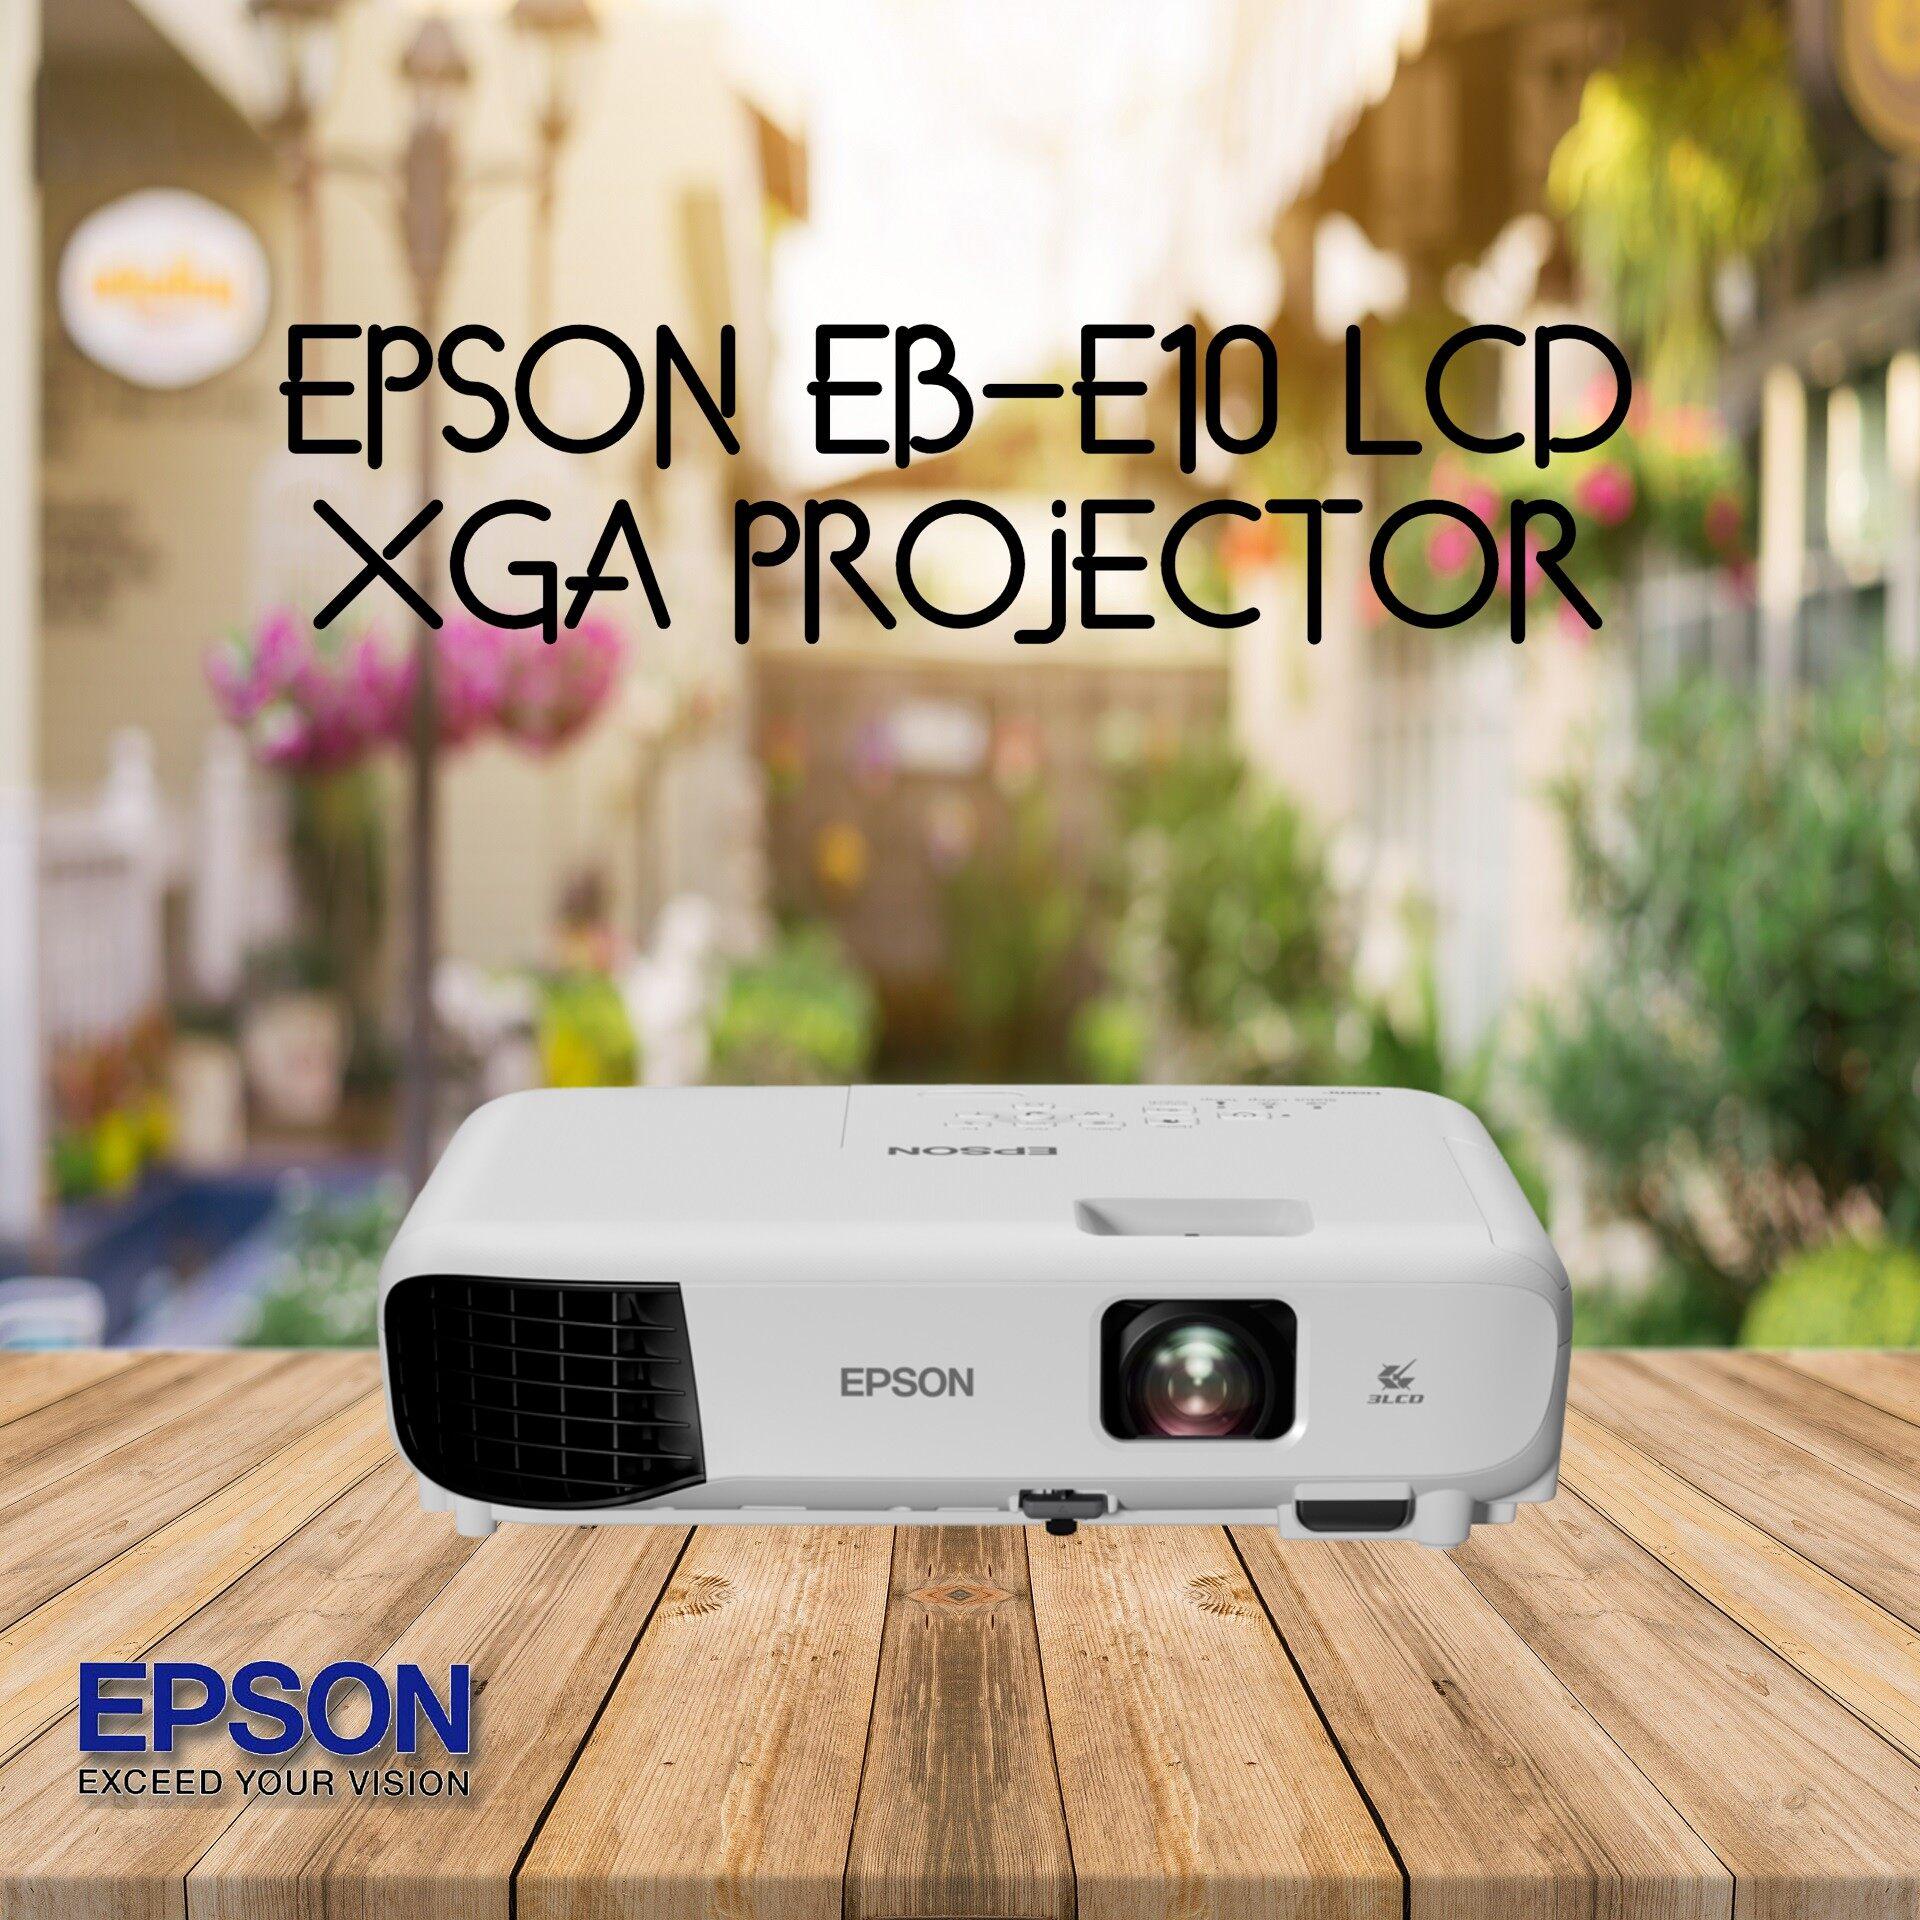 Epson EB-E10 XGA 3LCD EB E10 Projector REPLACED EB-S41